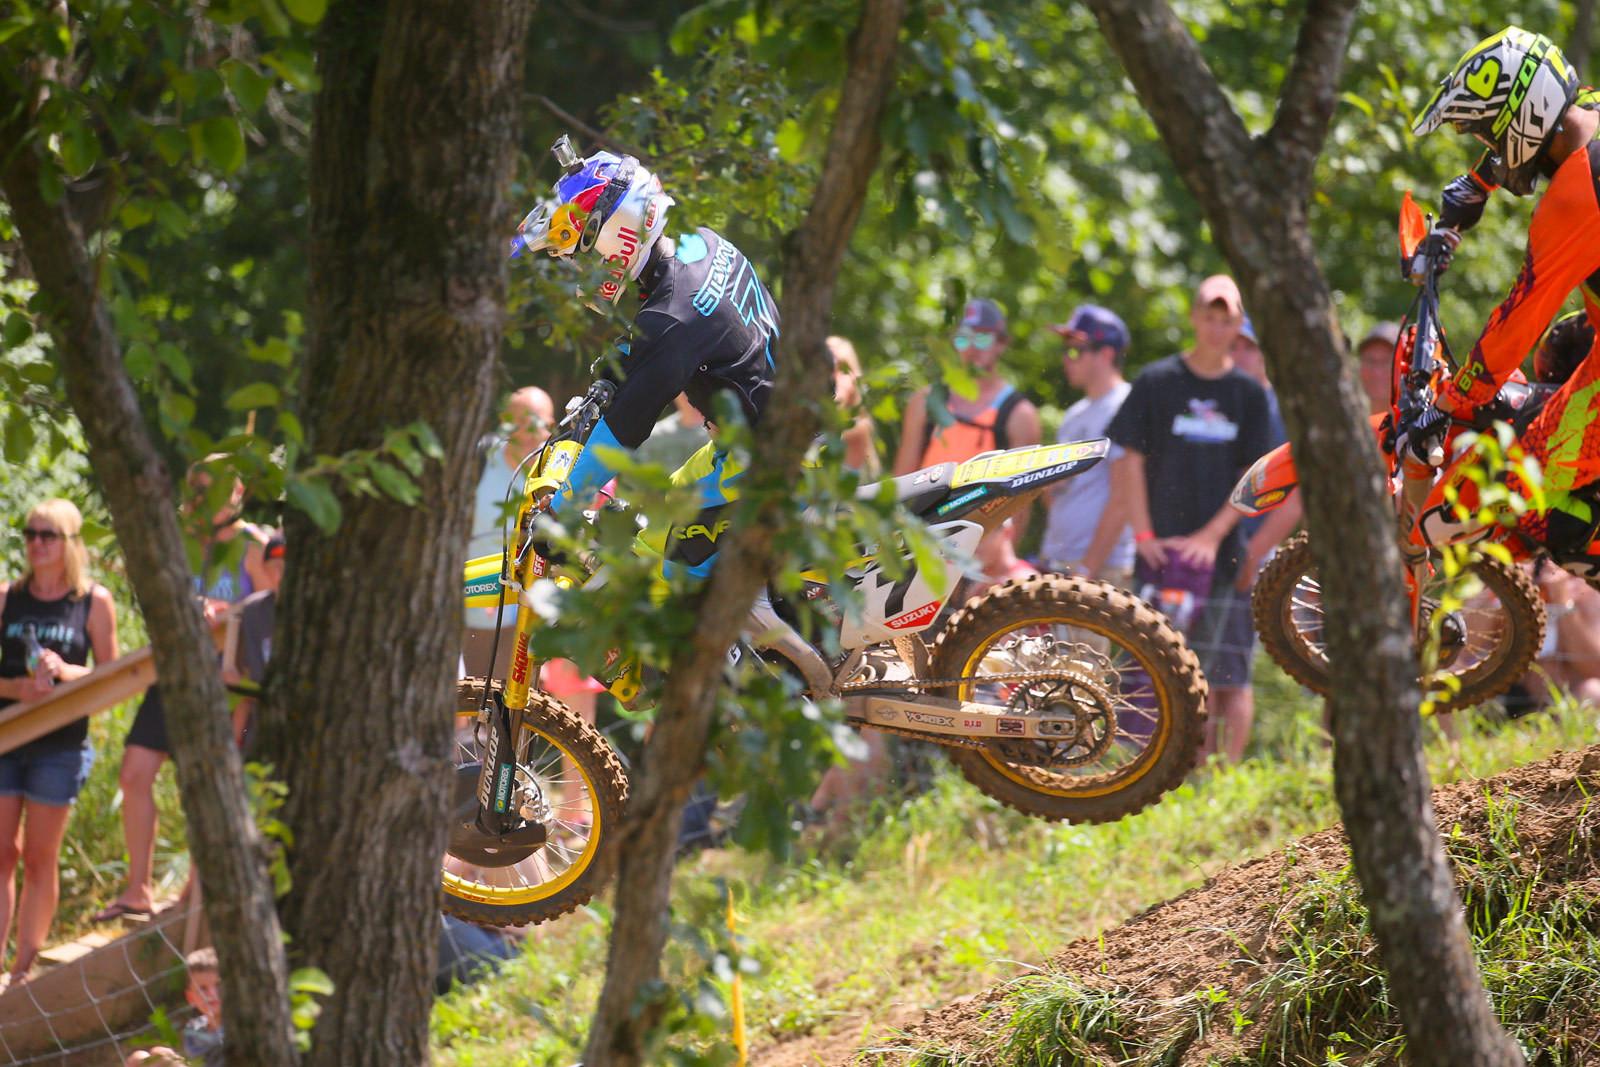 James Stewart and Justin Brayton - Photo Blast: Spring Creek - Motocross Pictures - Vital MX